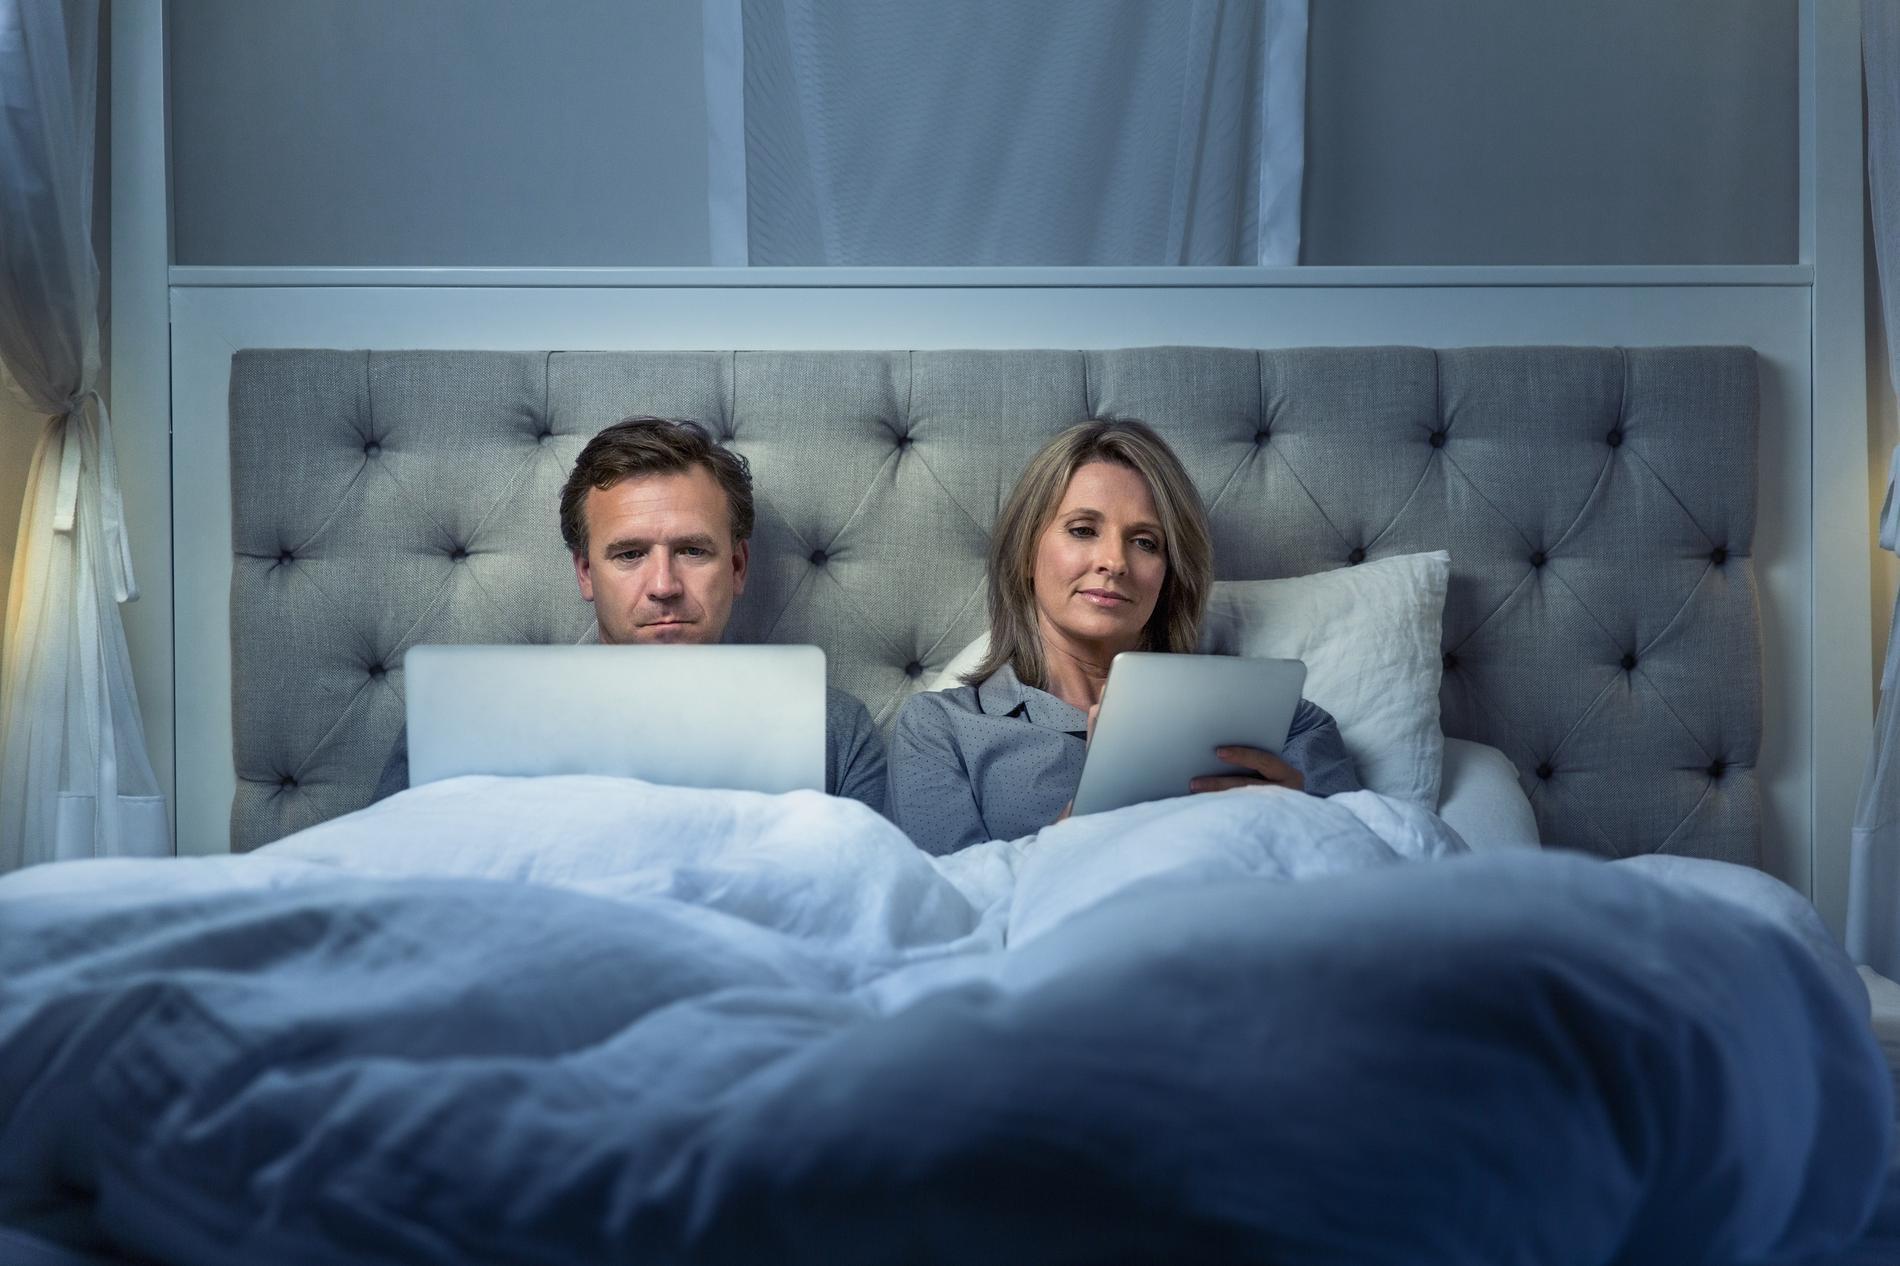 le smartphone au lit a tu ma vie sexuelle madame figaro. Black Bedroom Furniture Sets. Home Design Ideas